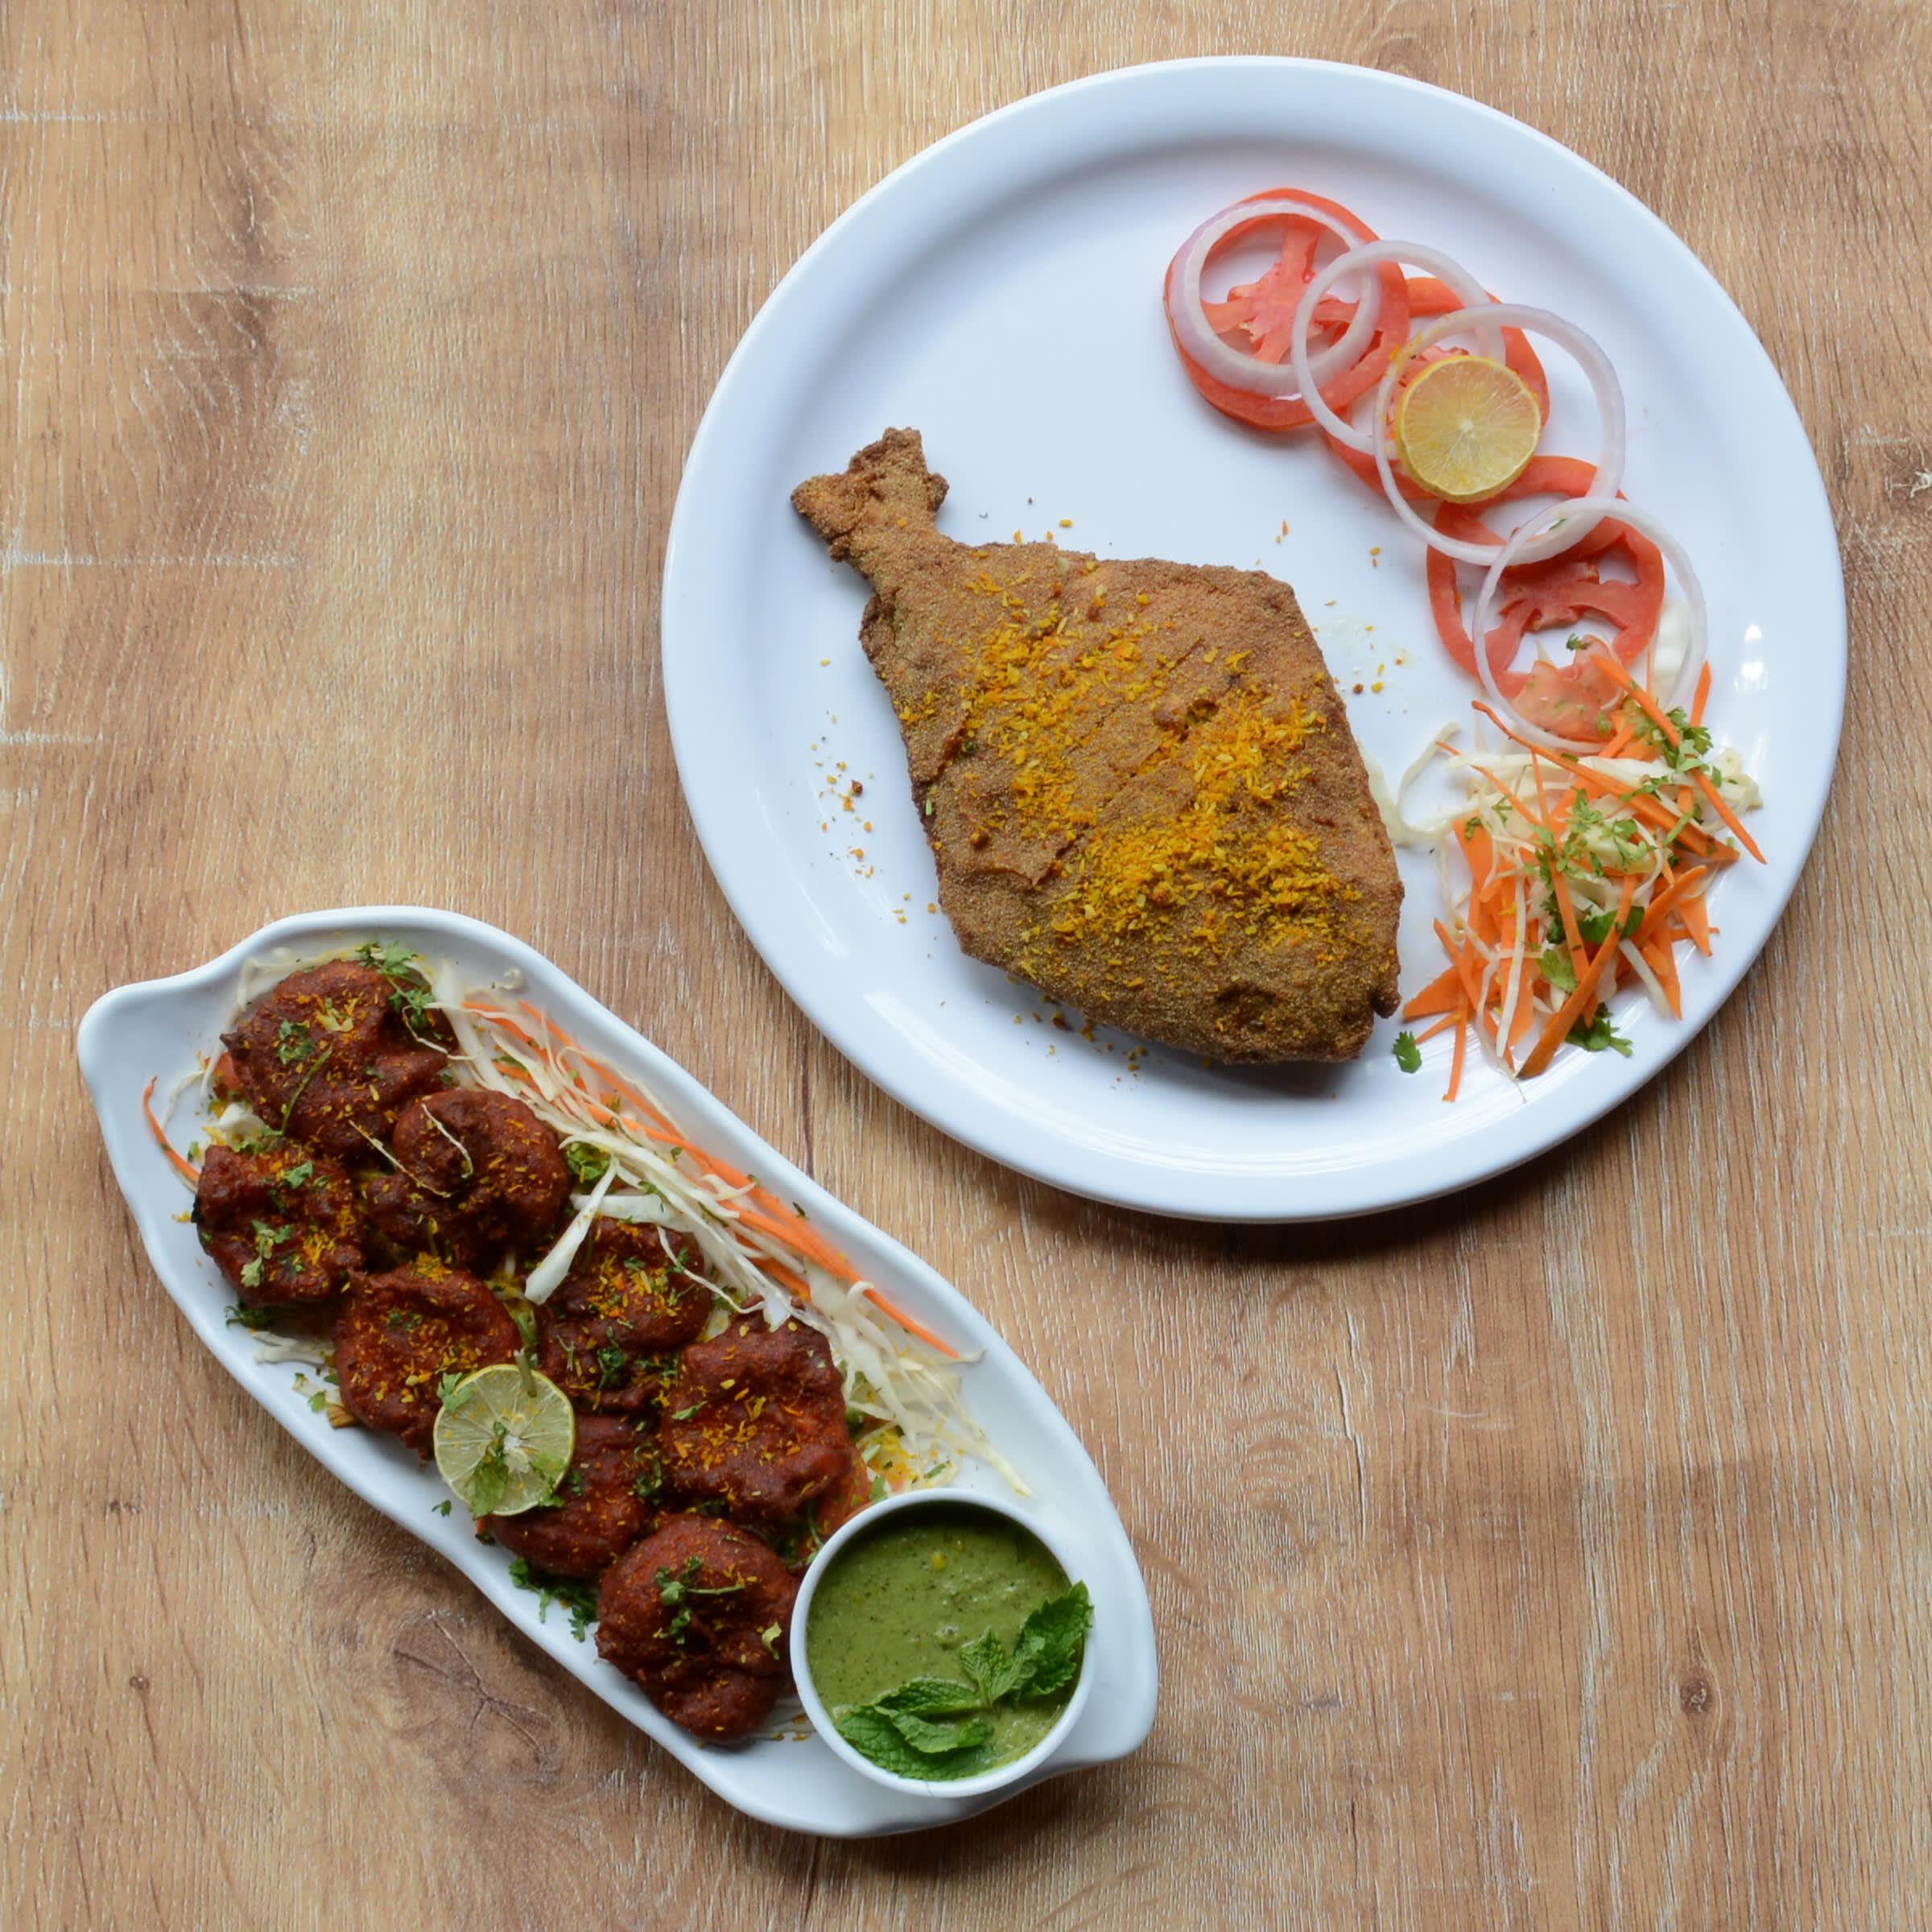 Fish Curry Maratheshahi Home Delivery Order Online Near Hotel Sai Ganga Pune Cantonment Board Hadapsar Pune